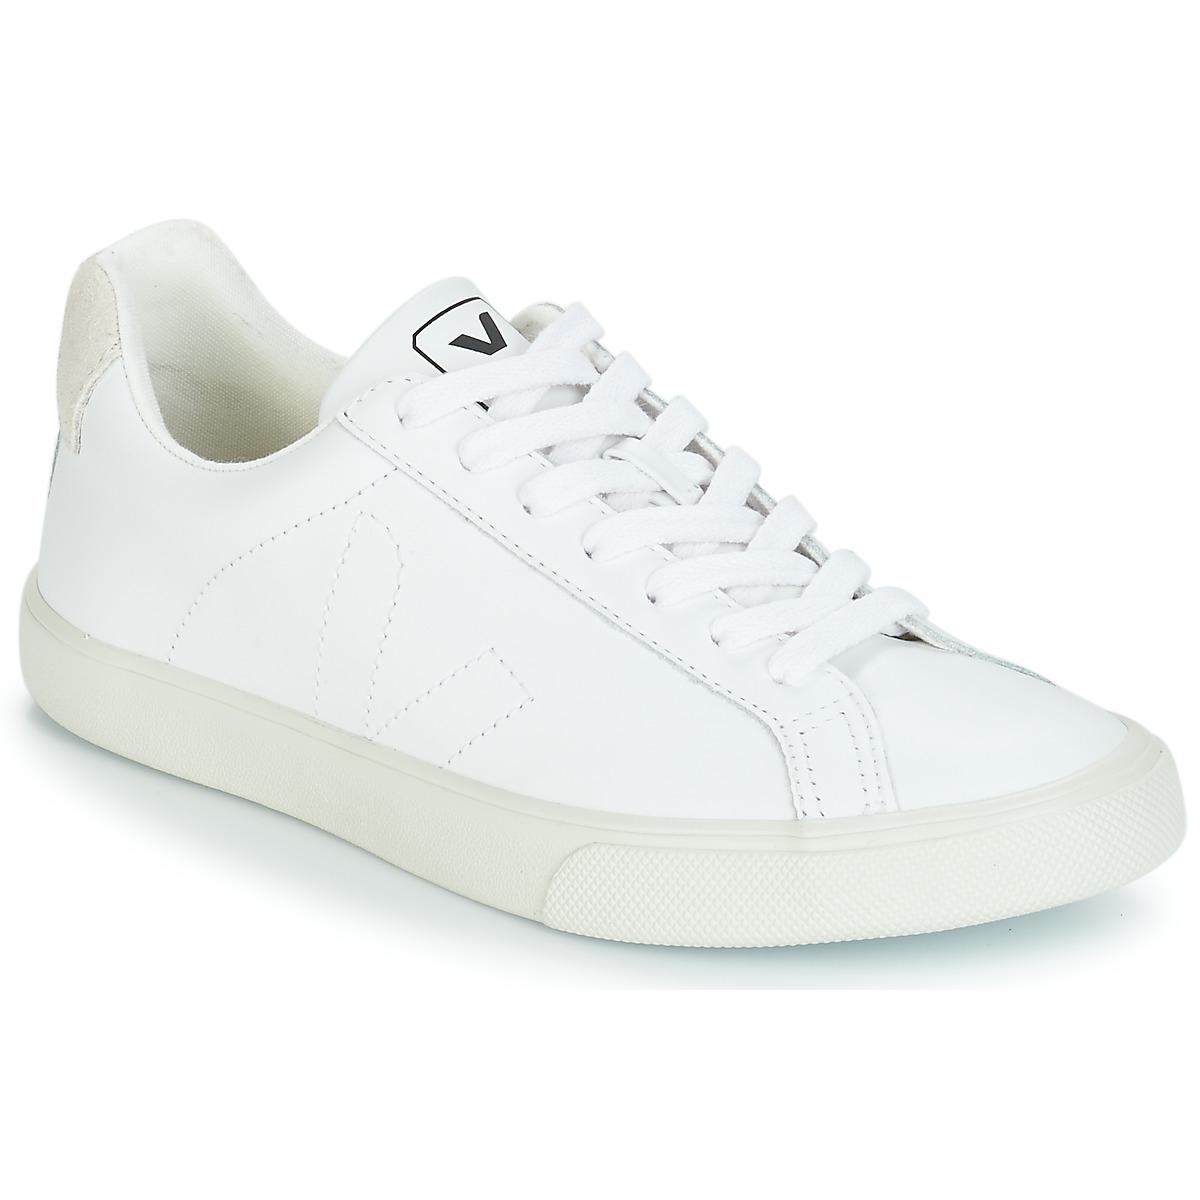 veja esplar lt blanc livraison gratuite avec chaussures baskets basses 84 10. Black Bedroom Furniture Sets. Home Design Ideas